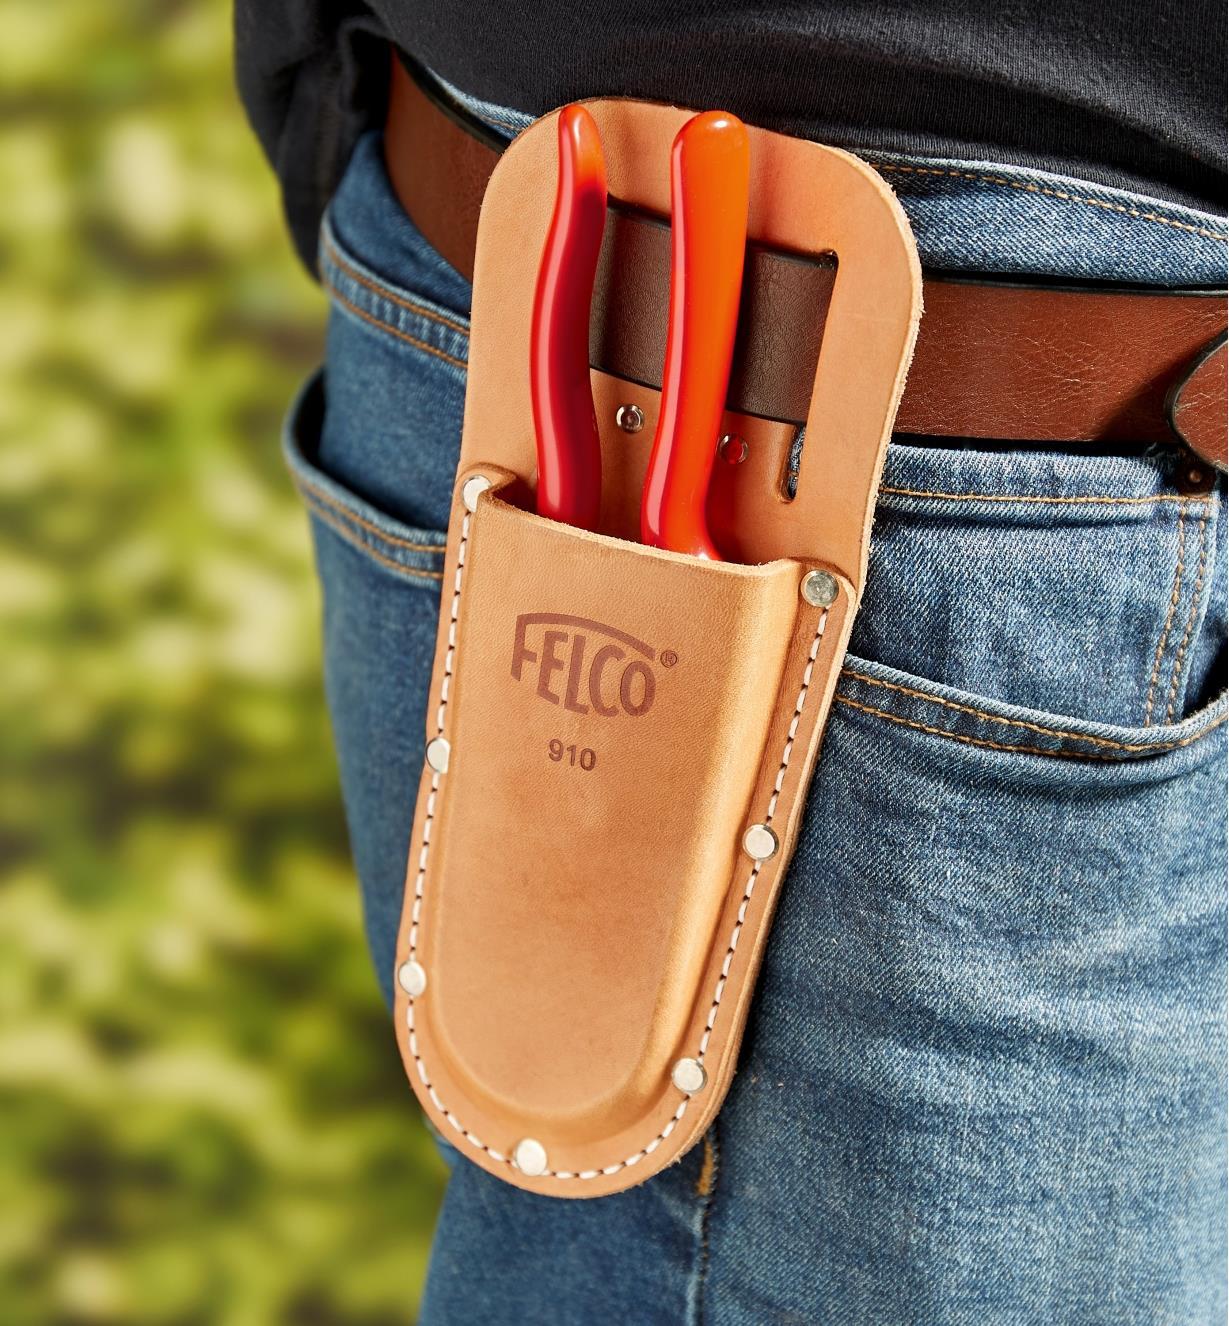 A gardener carries a Felco hand pruner in a pruner holster worn on the hip